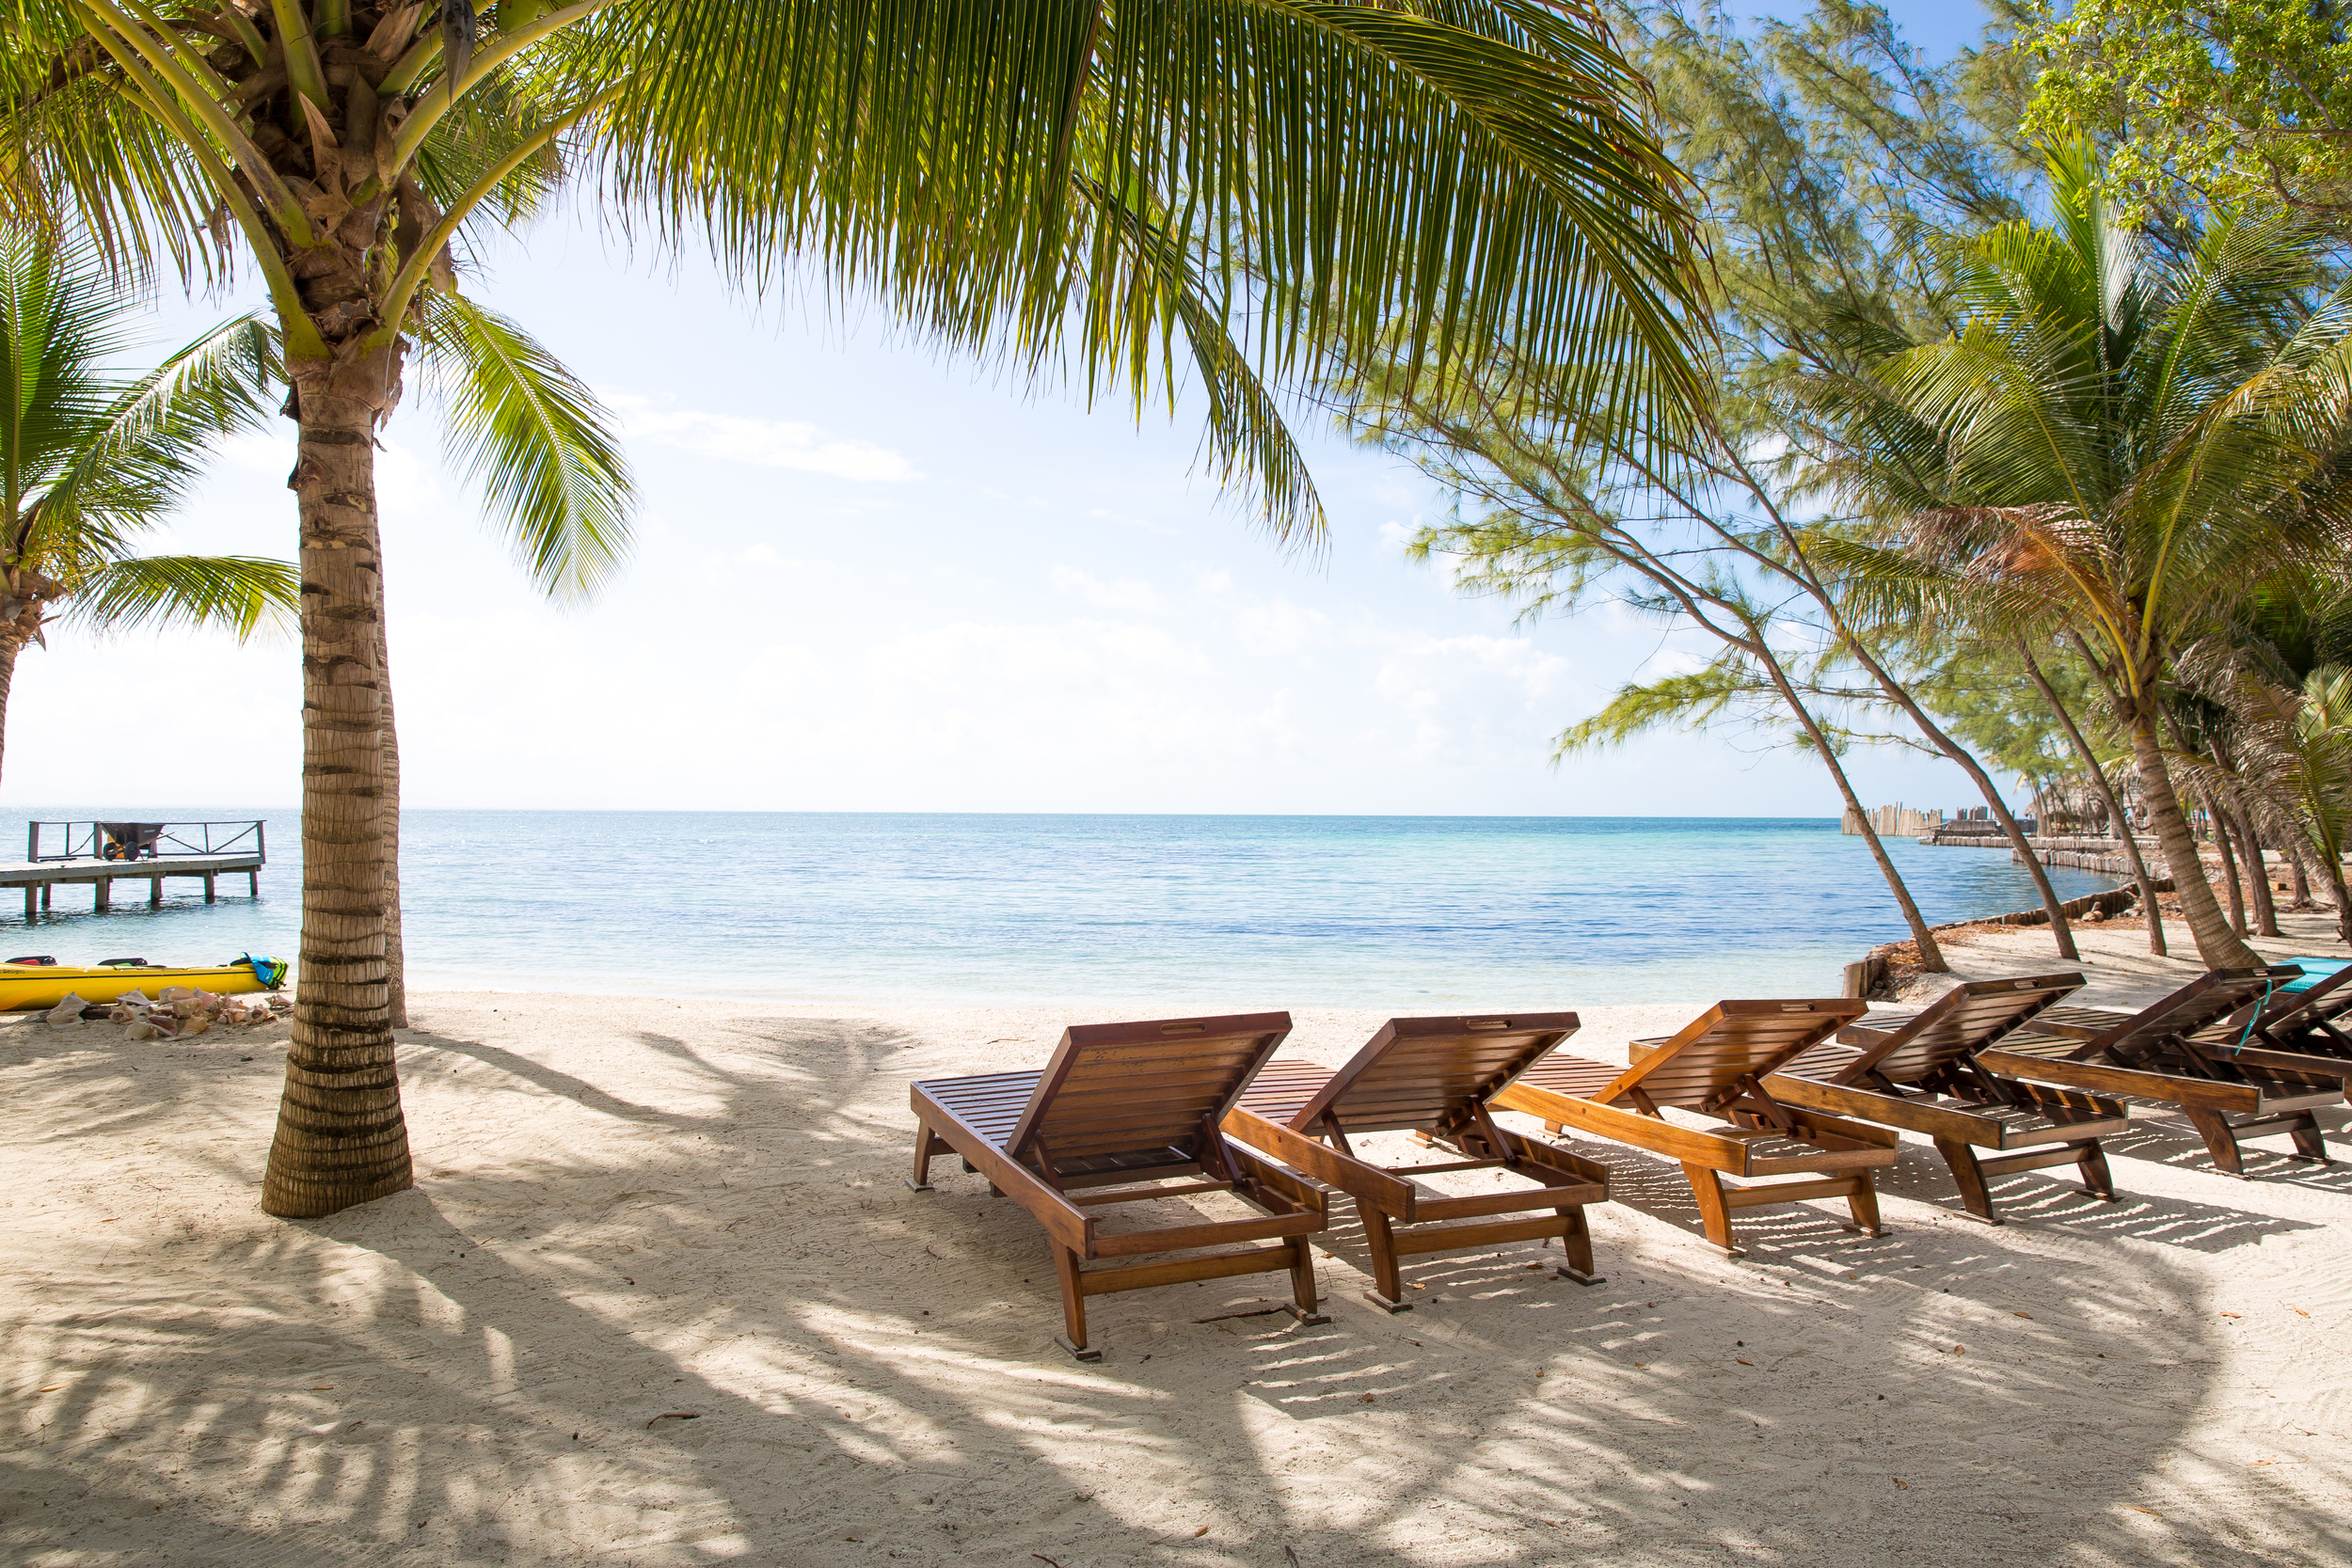 Thatch Caye Island Resort